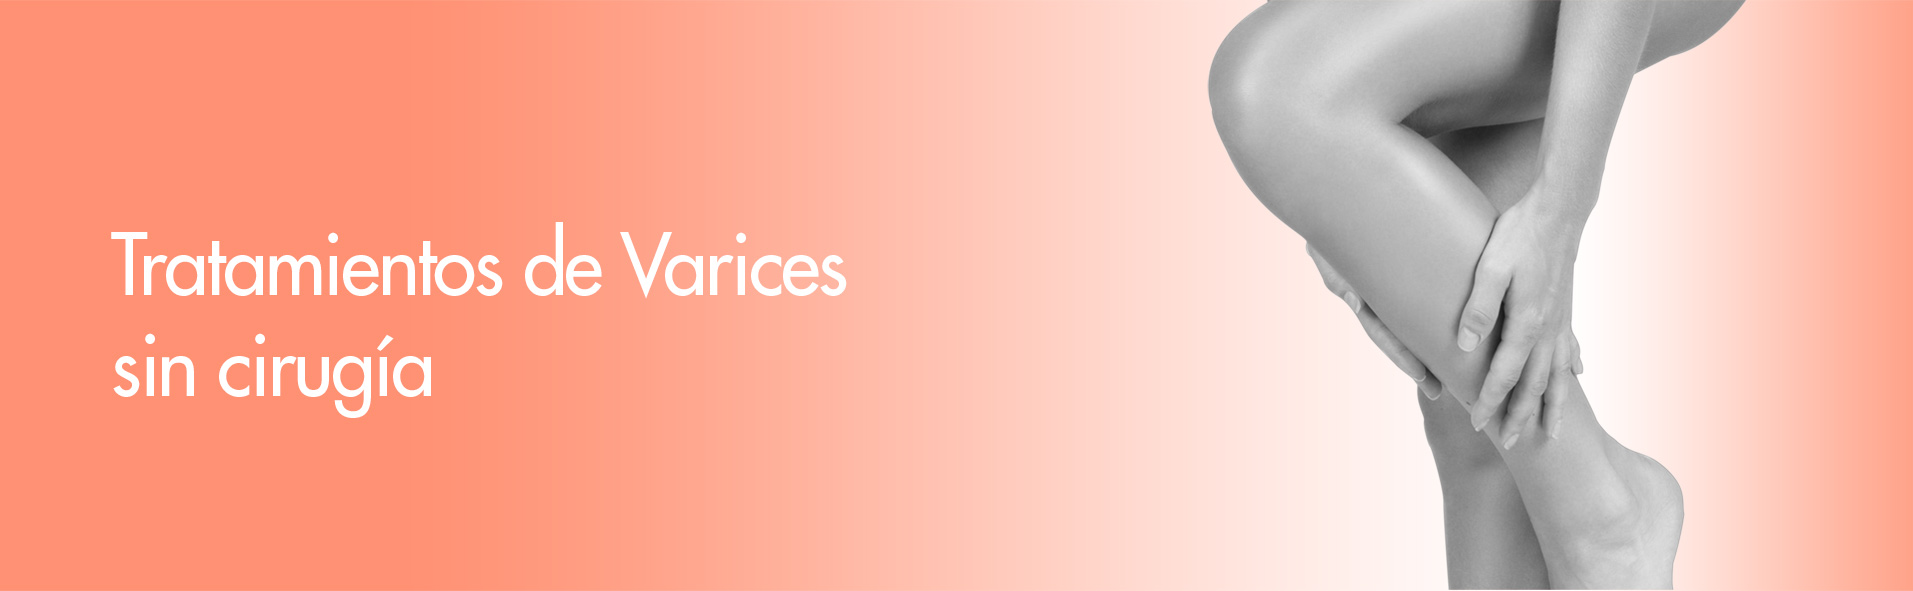 banner varices